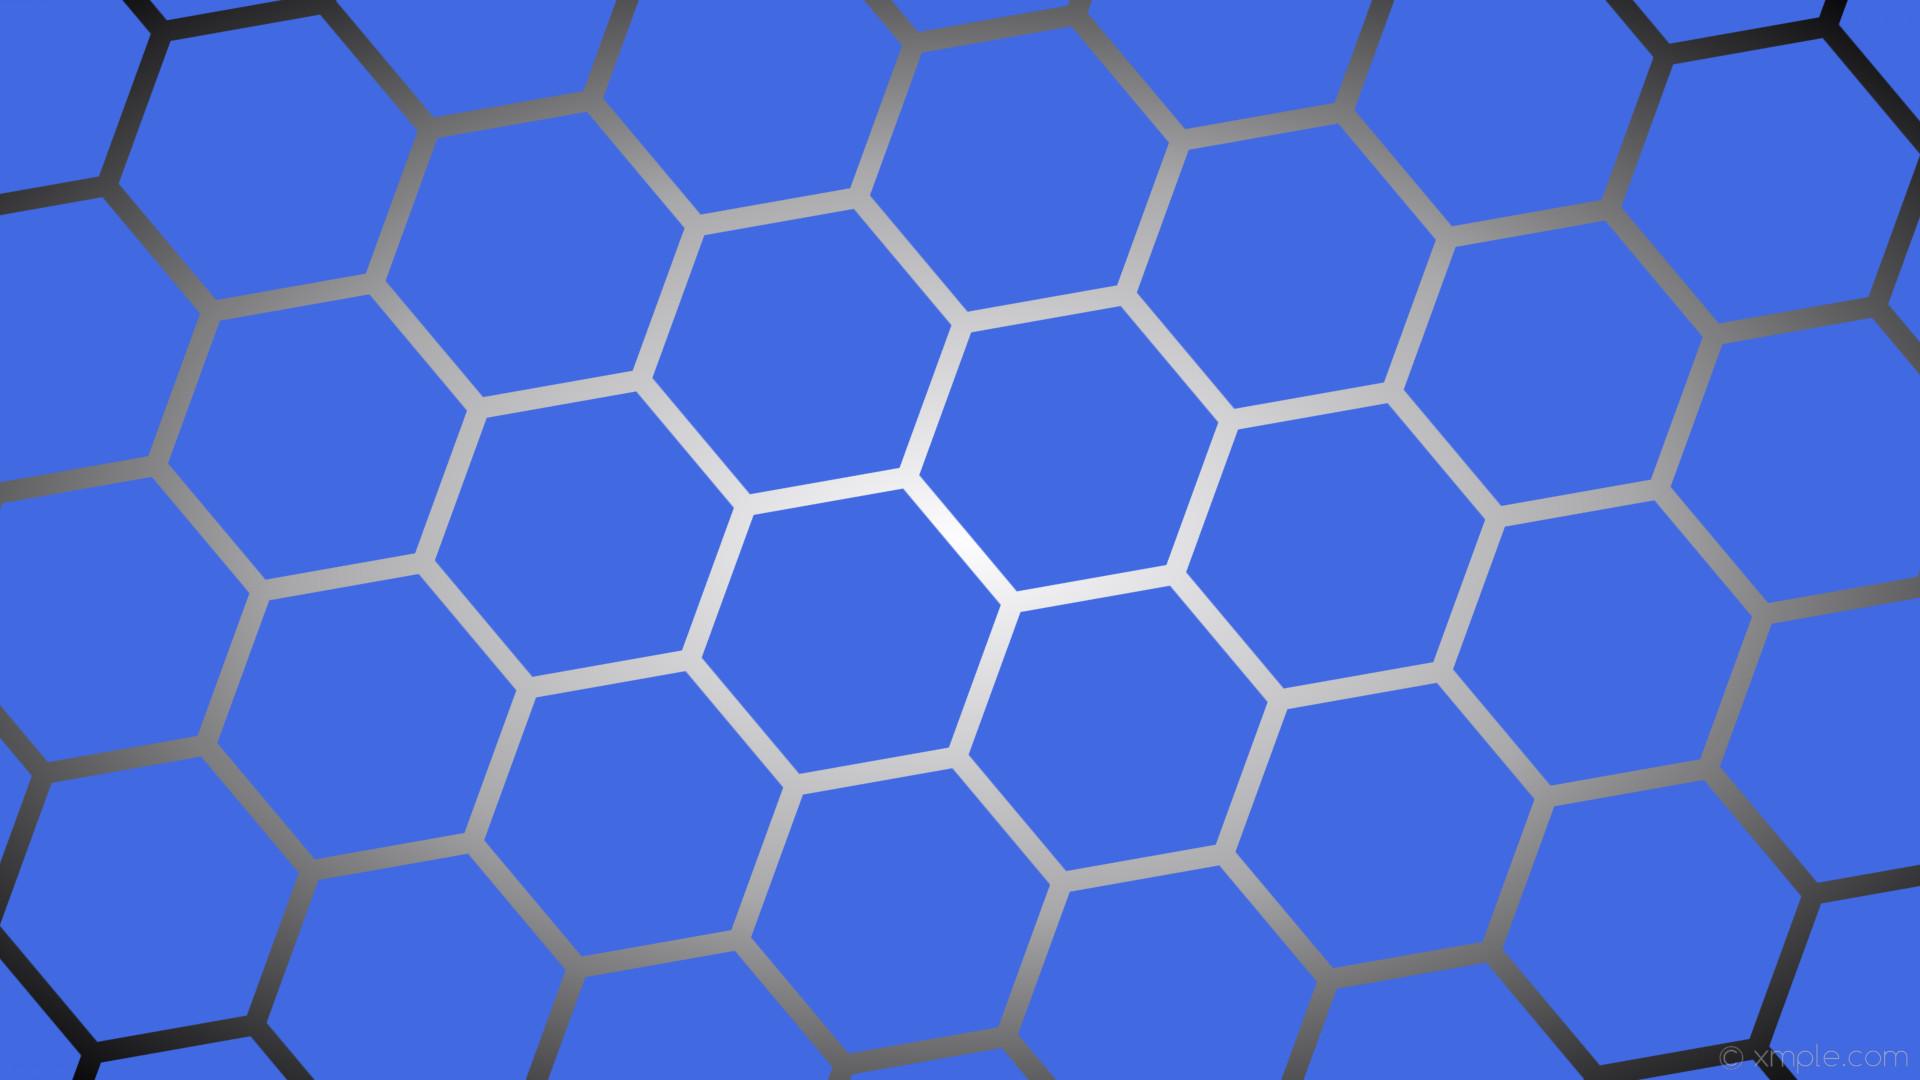 wallpaper grey gradient hexagon black blue white glow royal blue dark gray  #4169e1 #ffffff